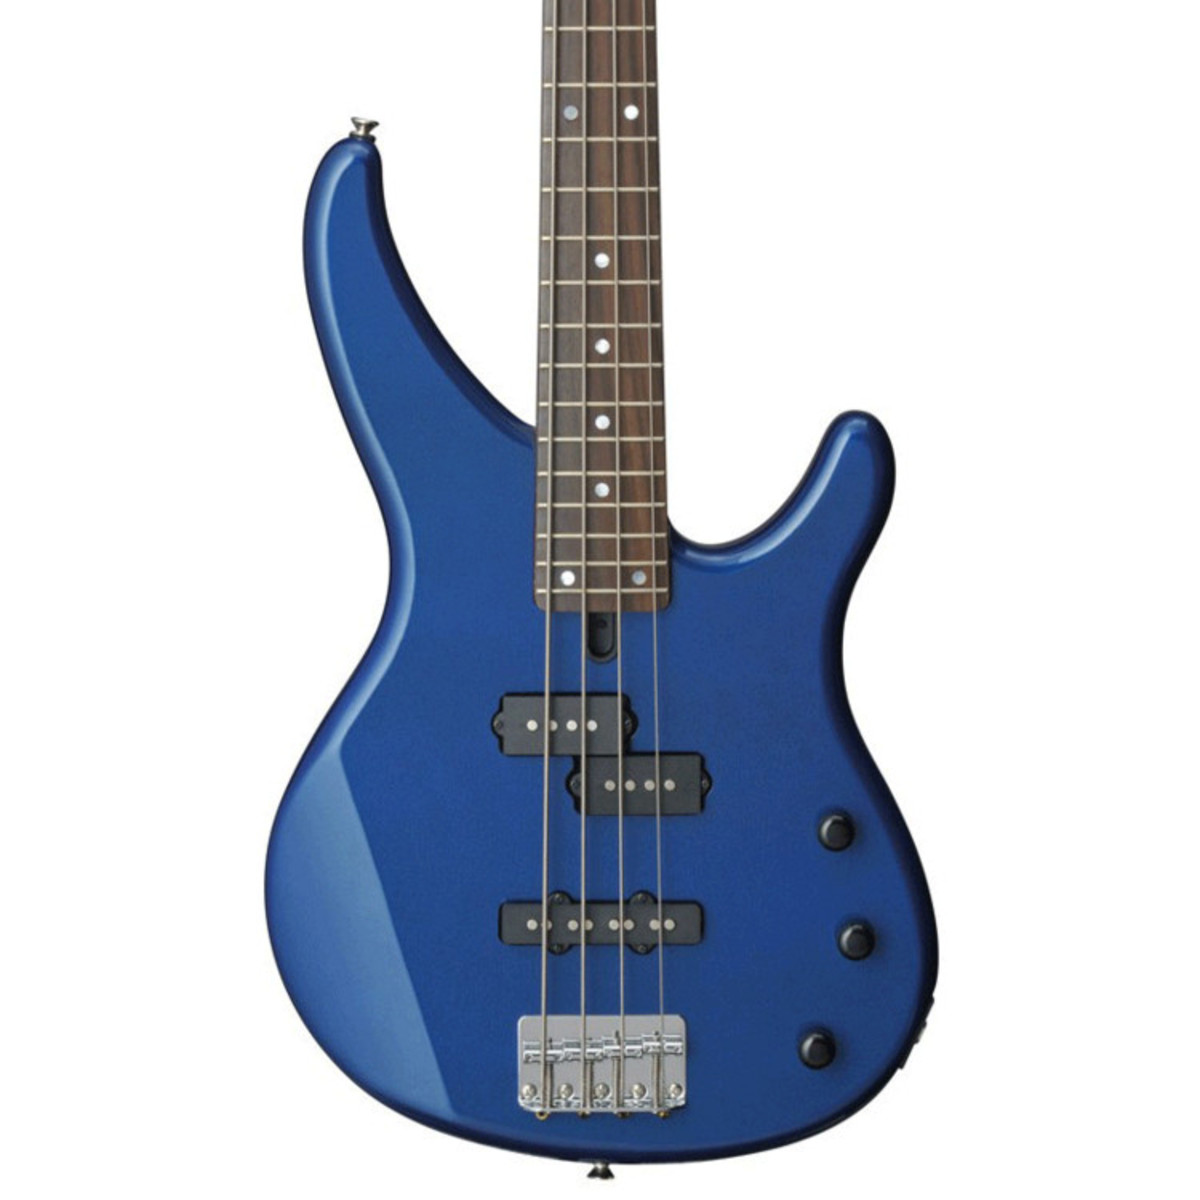 yamaha trbx174 guitare basse bleu m tallique fonc. Black Bedroom Furniture Sets. Home Design Ideas